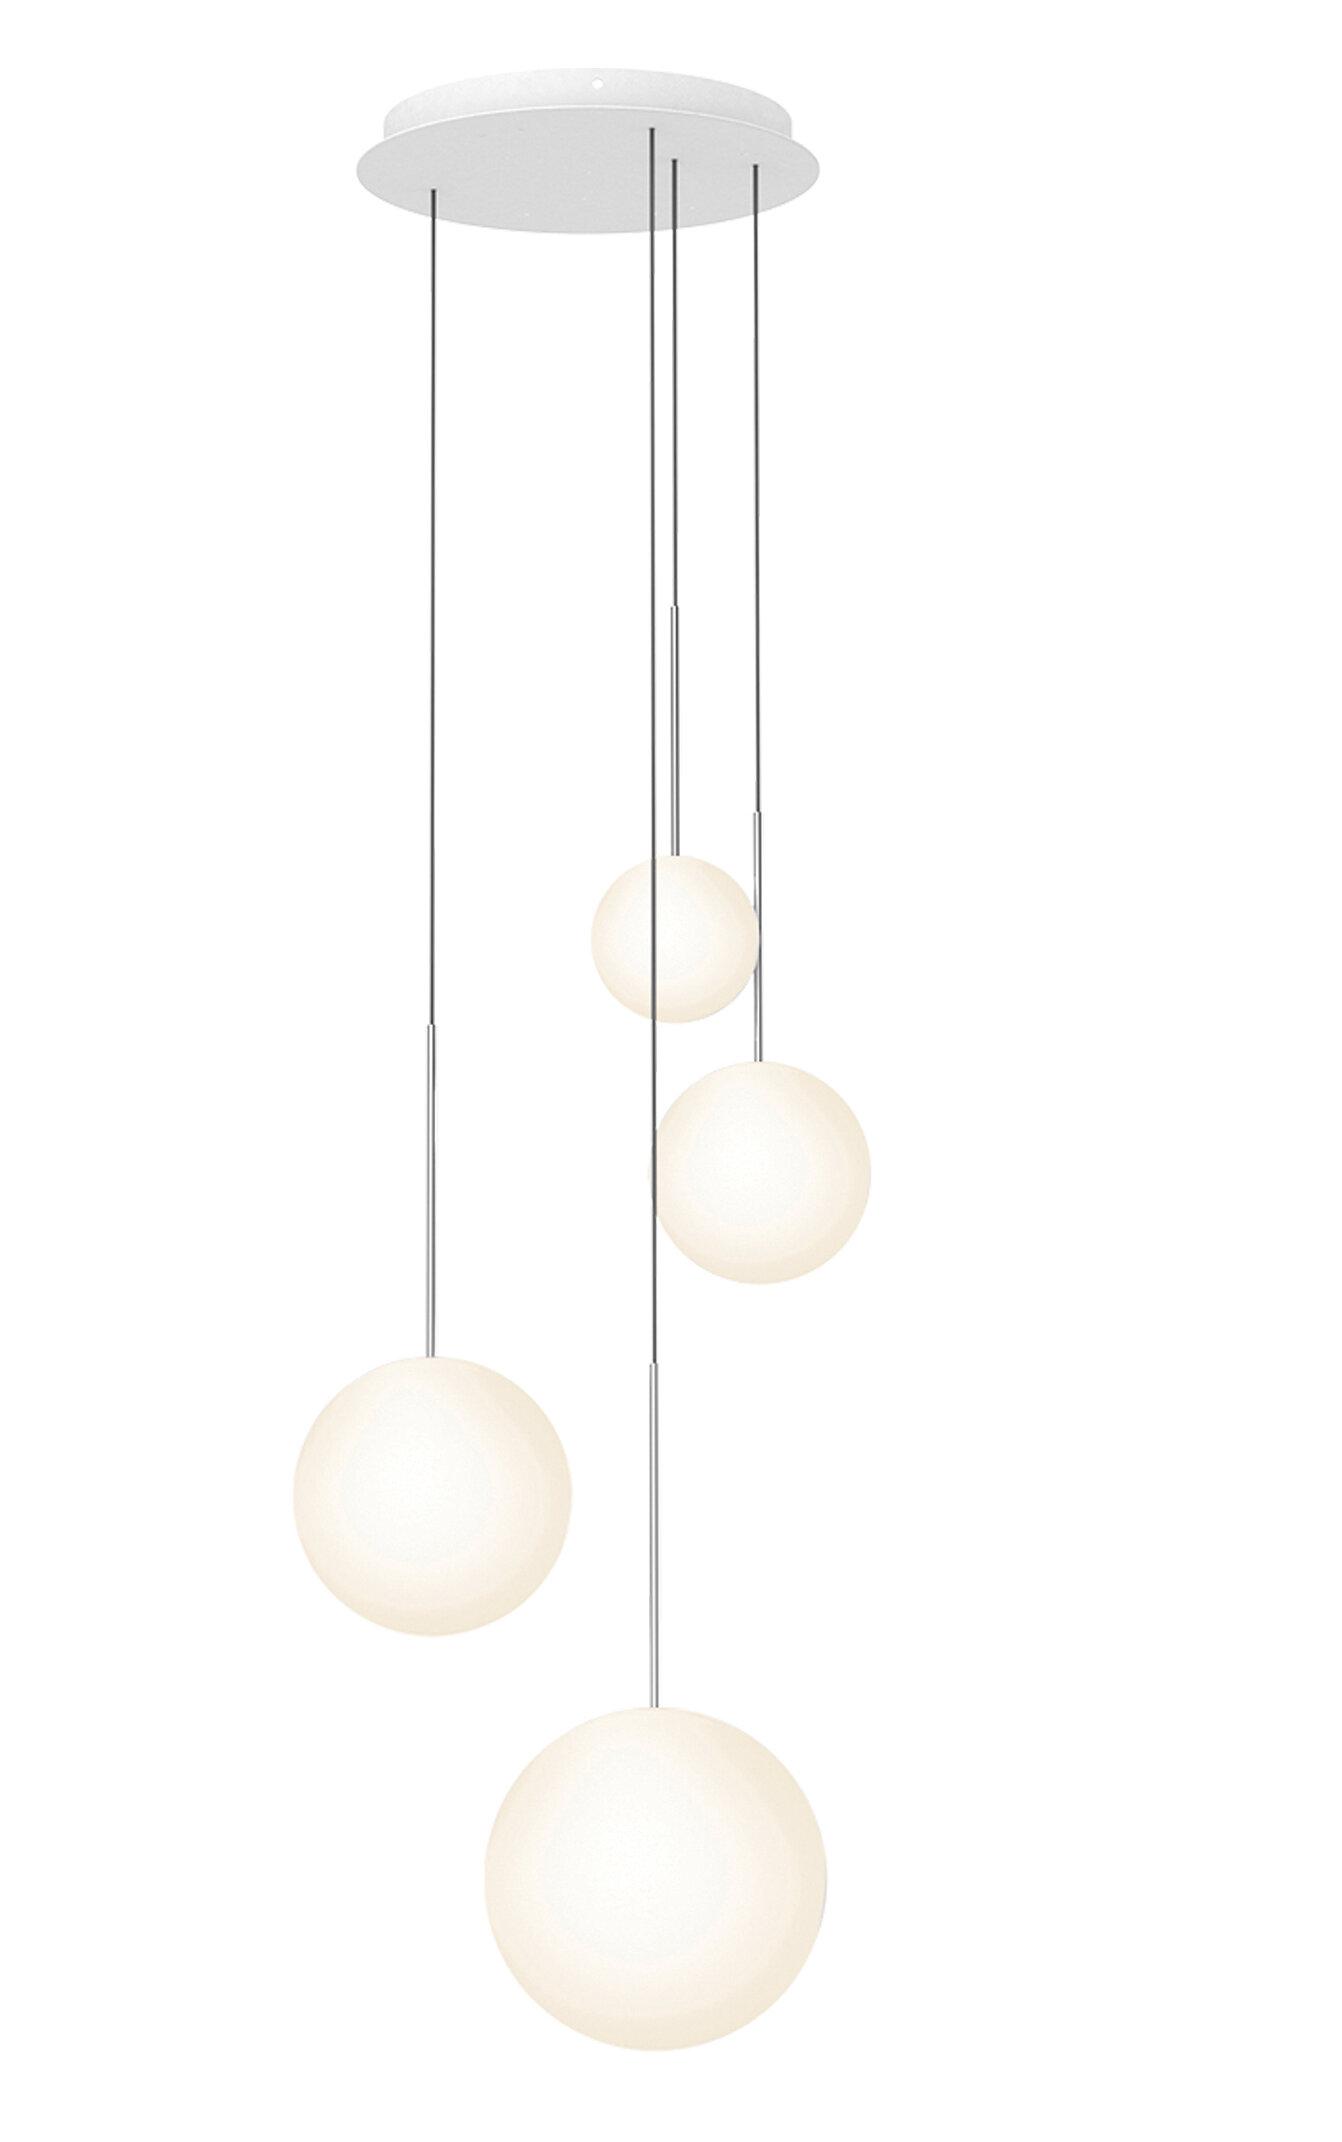 Pablo Designs Bola 4 Light Cluster Globe Led Pendant Wayfair Ca